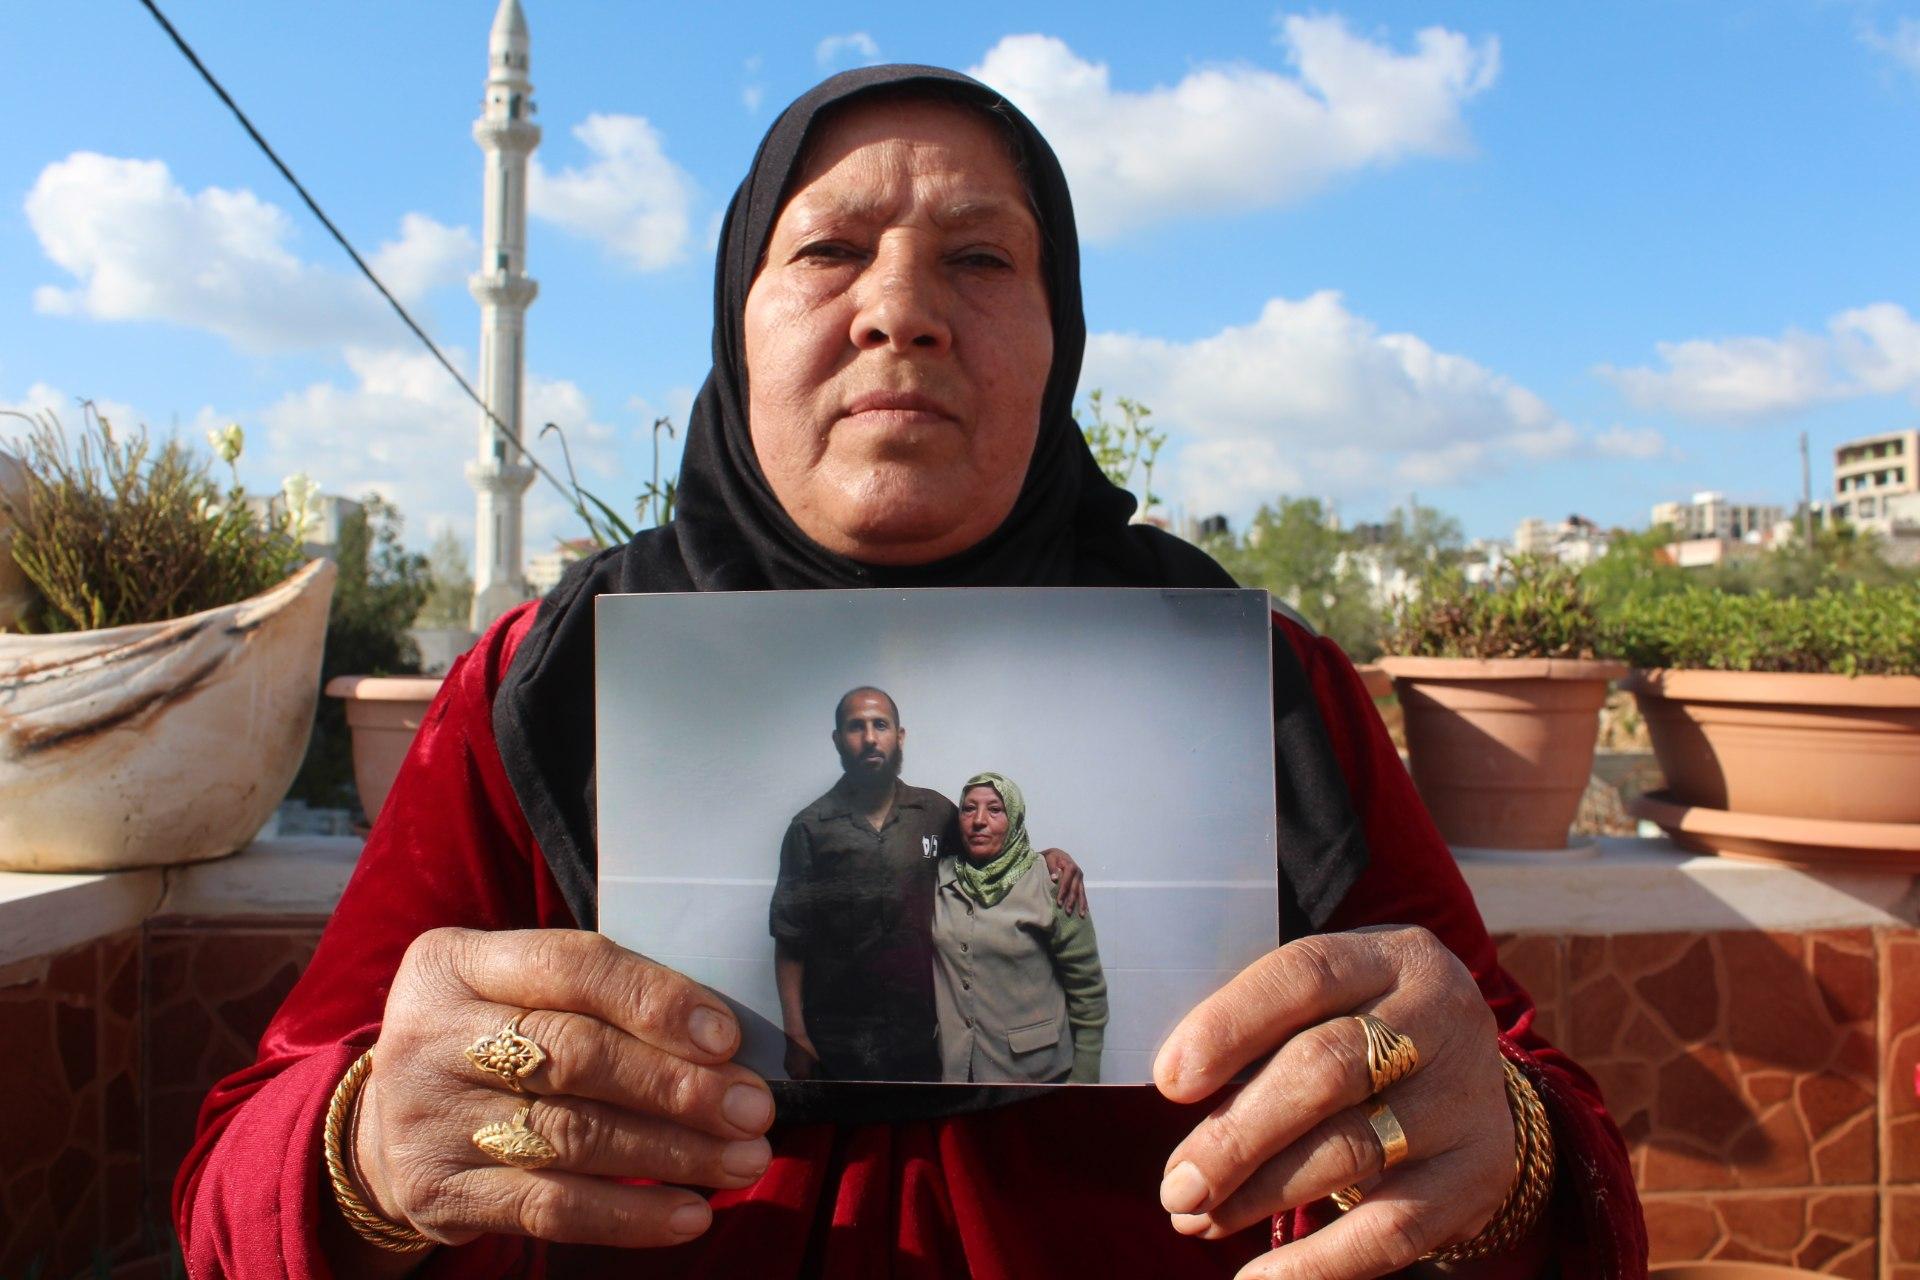 Myassar Hammad's son was given seven life sentences (MEE/Shatha Hammad)